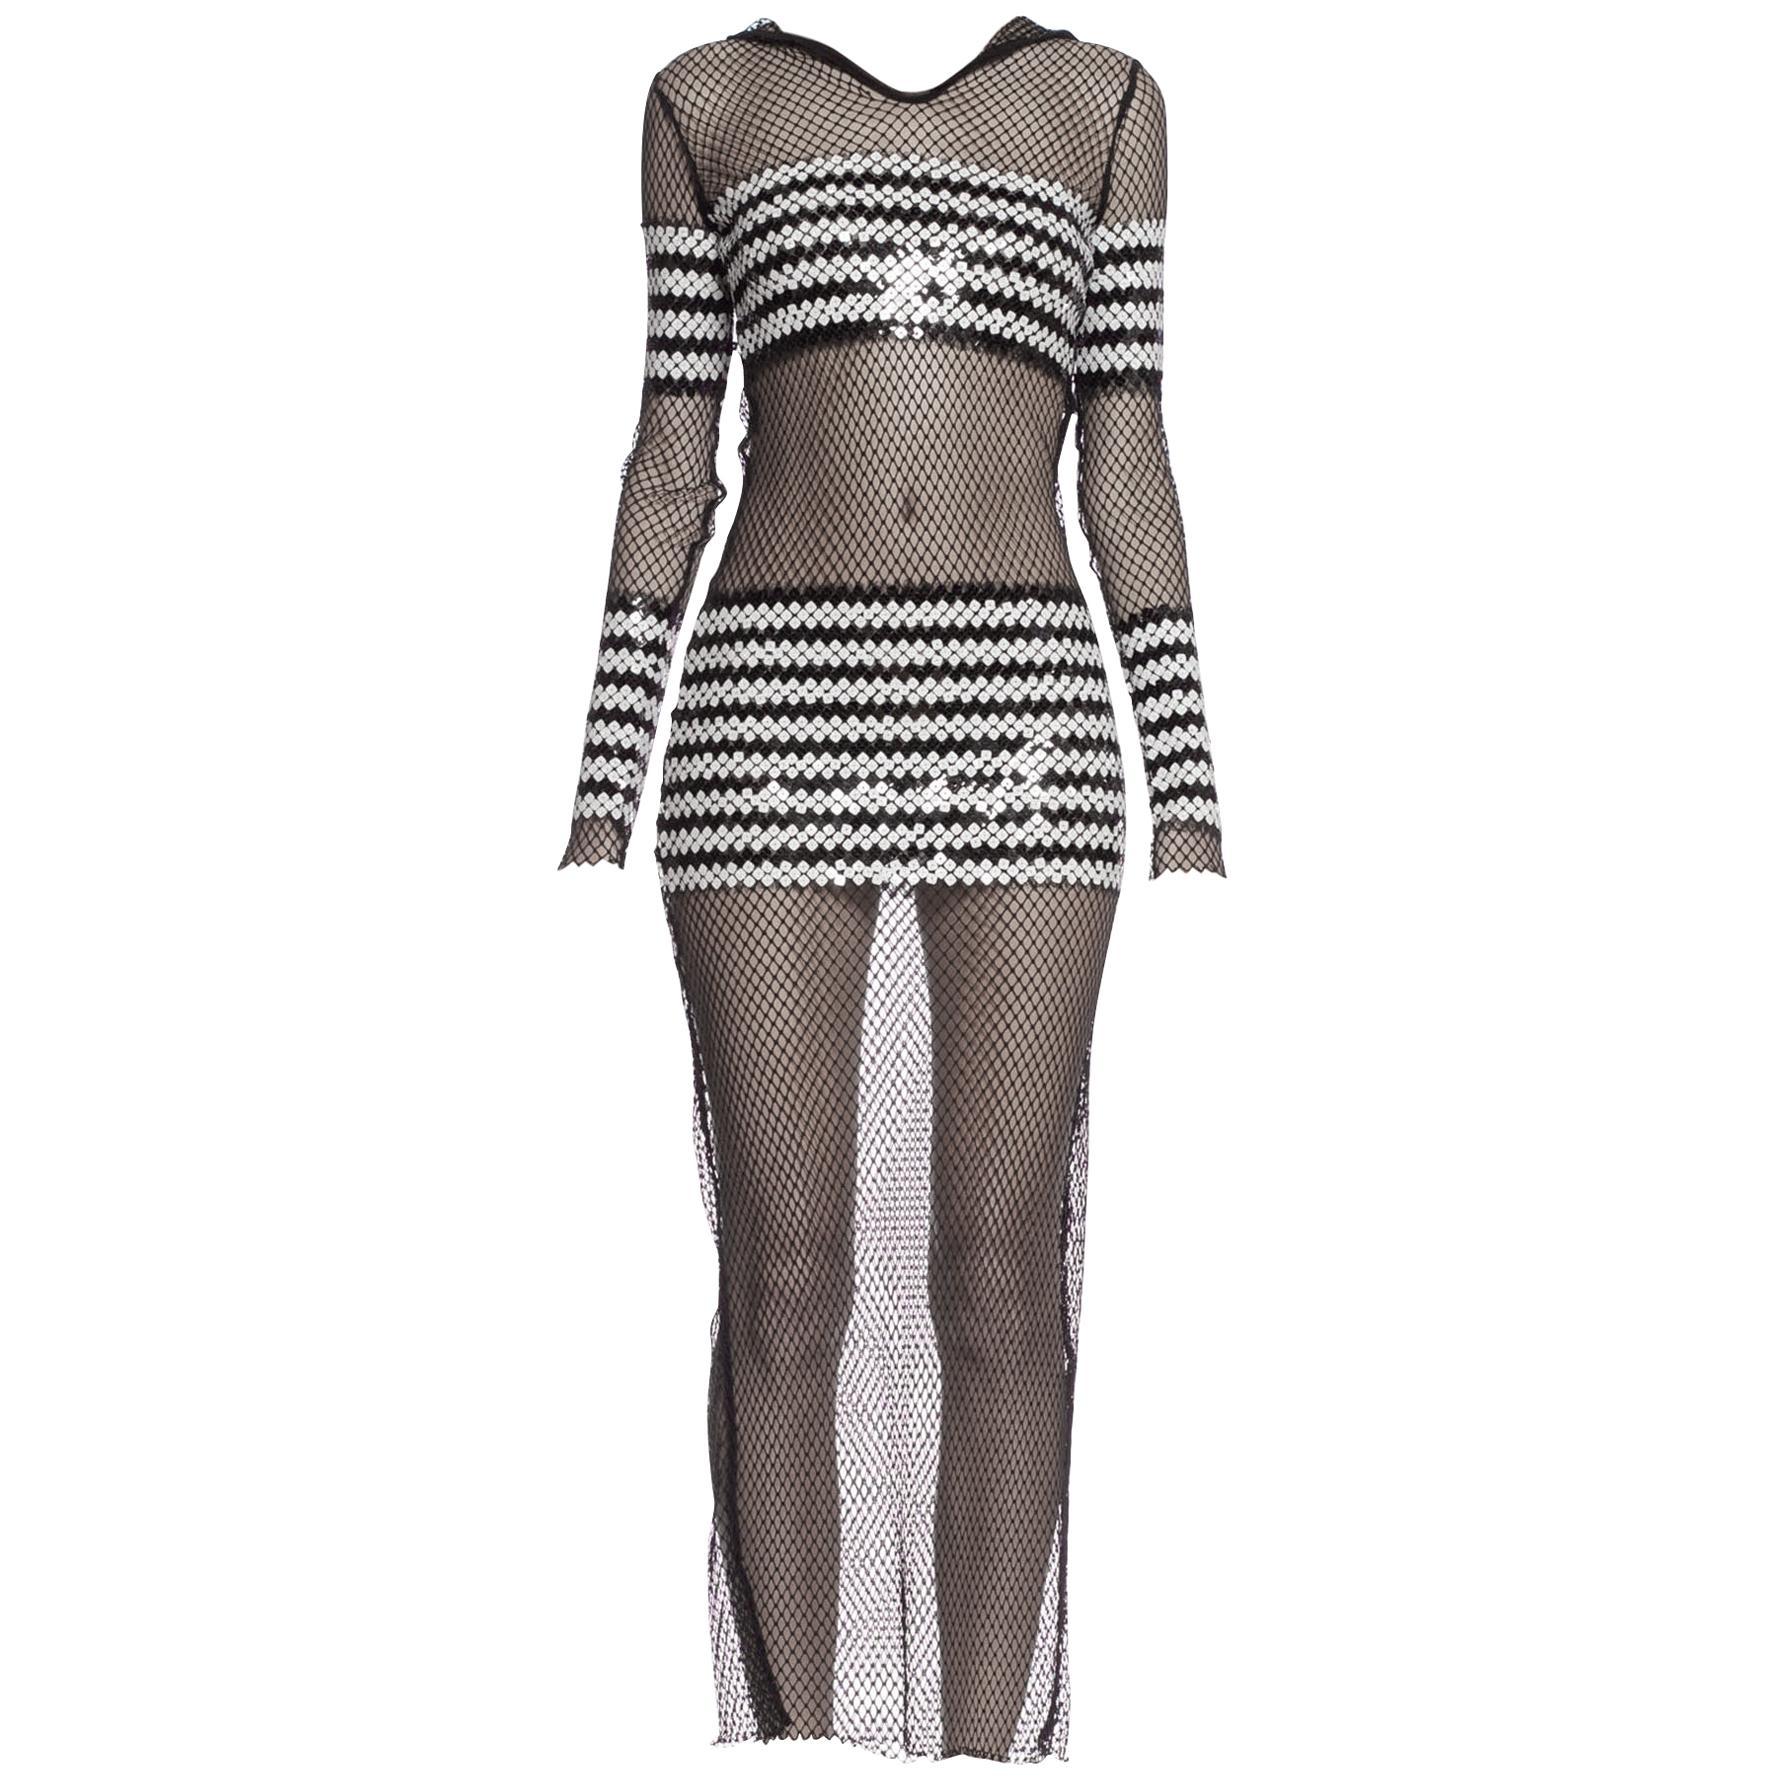 1990S JEAN PAUL GAULTIER Black Sheer JPG Fishnet Sailor Stripe Sequin Dress Wit